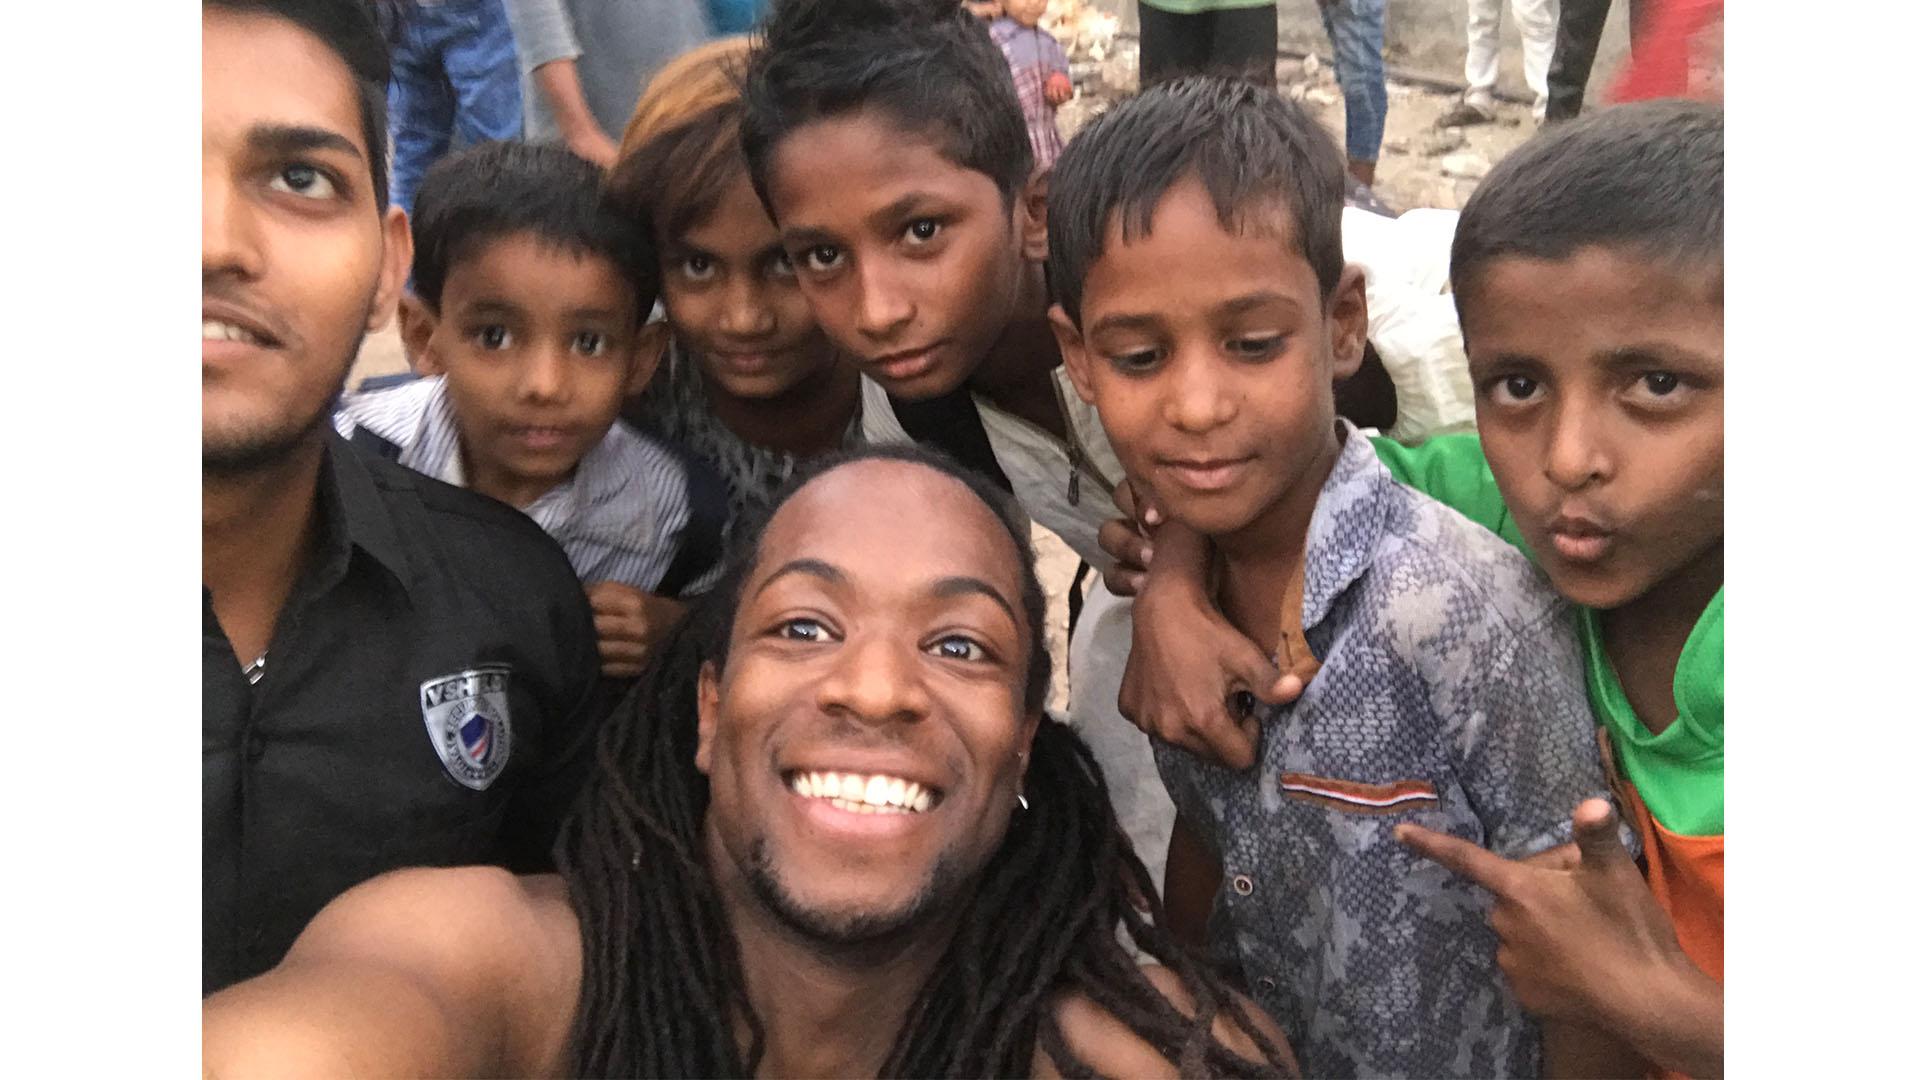 Nigel Clarke selfie with the locals in Mumbai